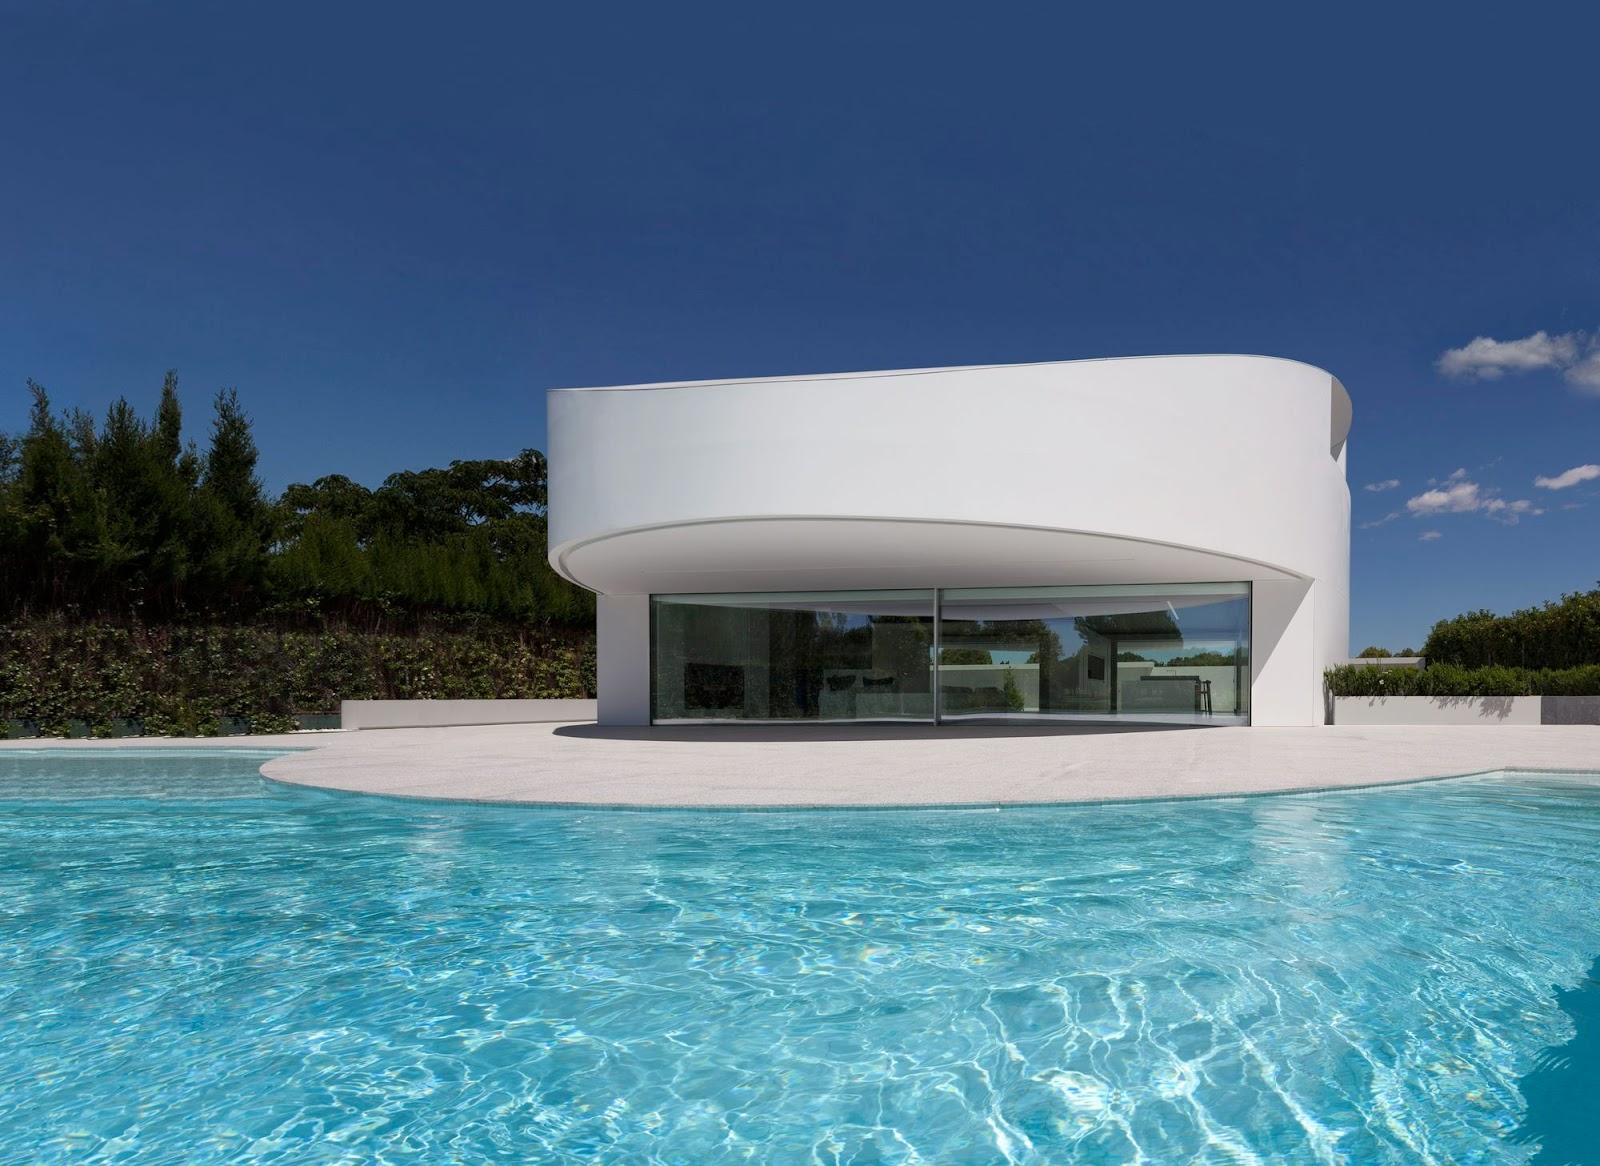 A f a s i a fran silvestre arquitectos for Casas modernas redondas